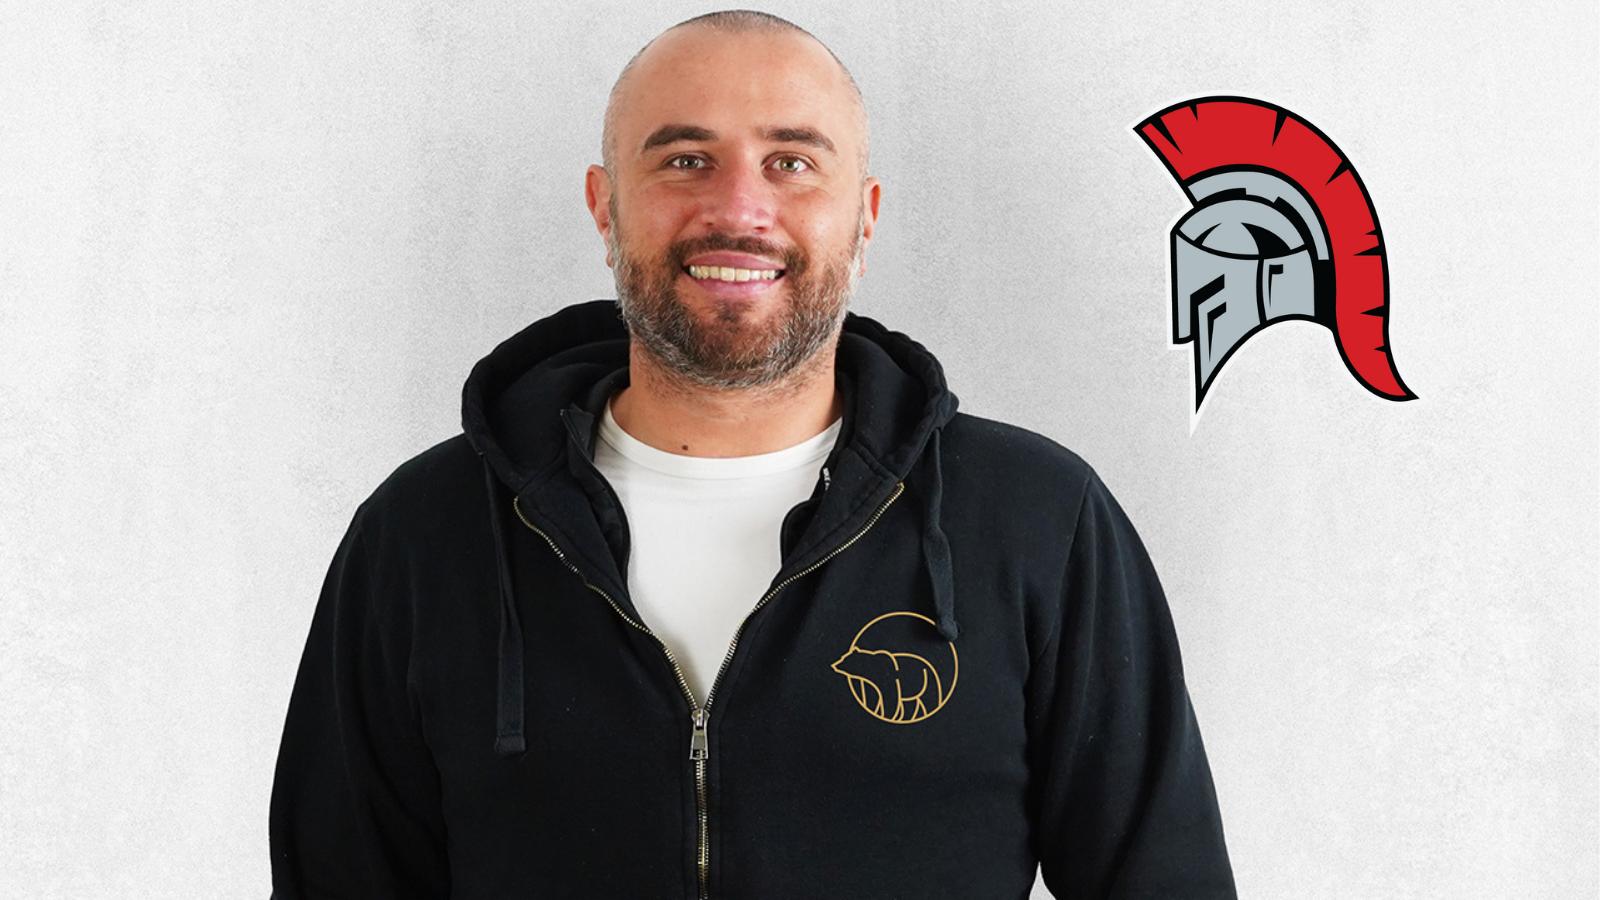 Cologne Centurions announce Frank Roser as new Head Coach